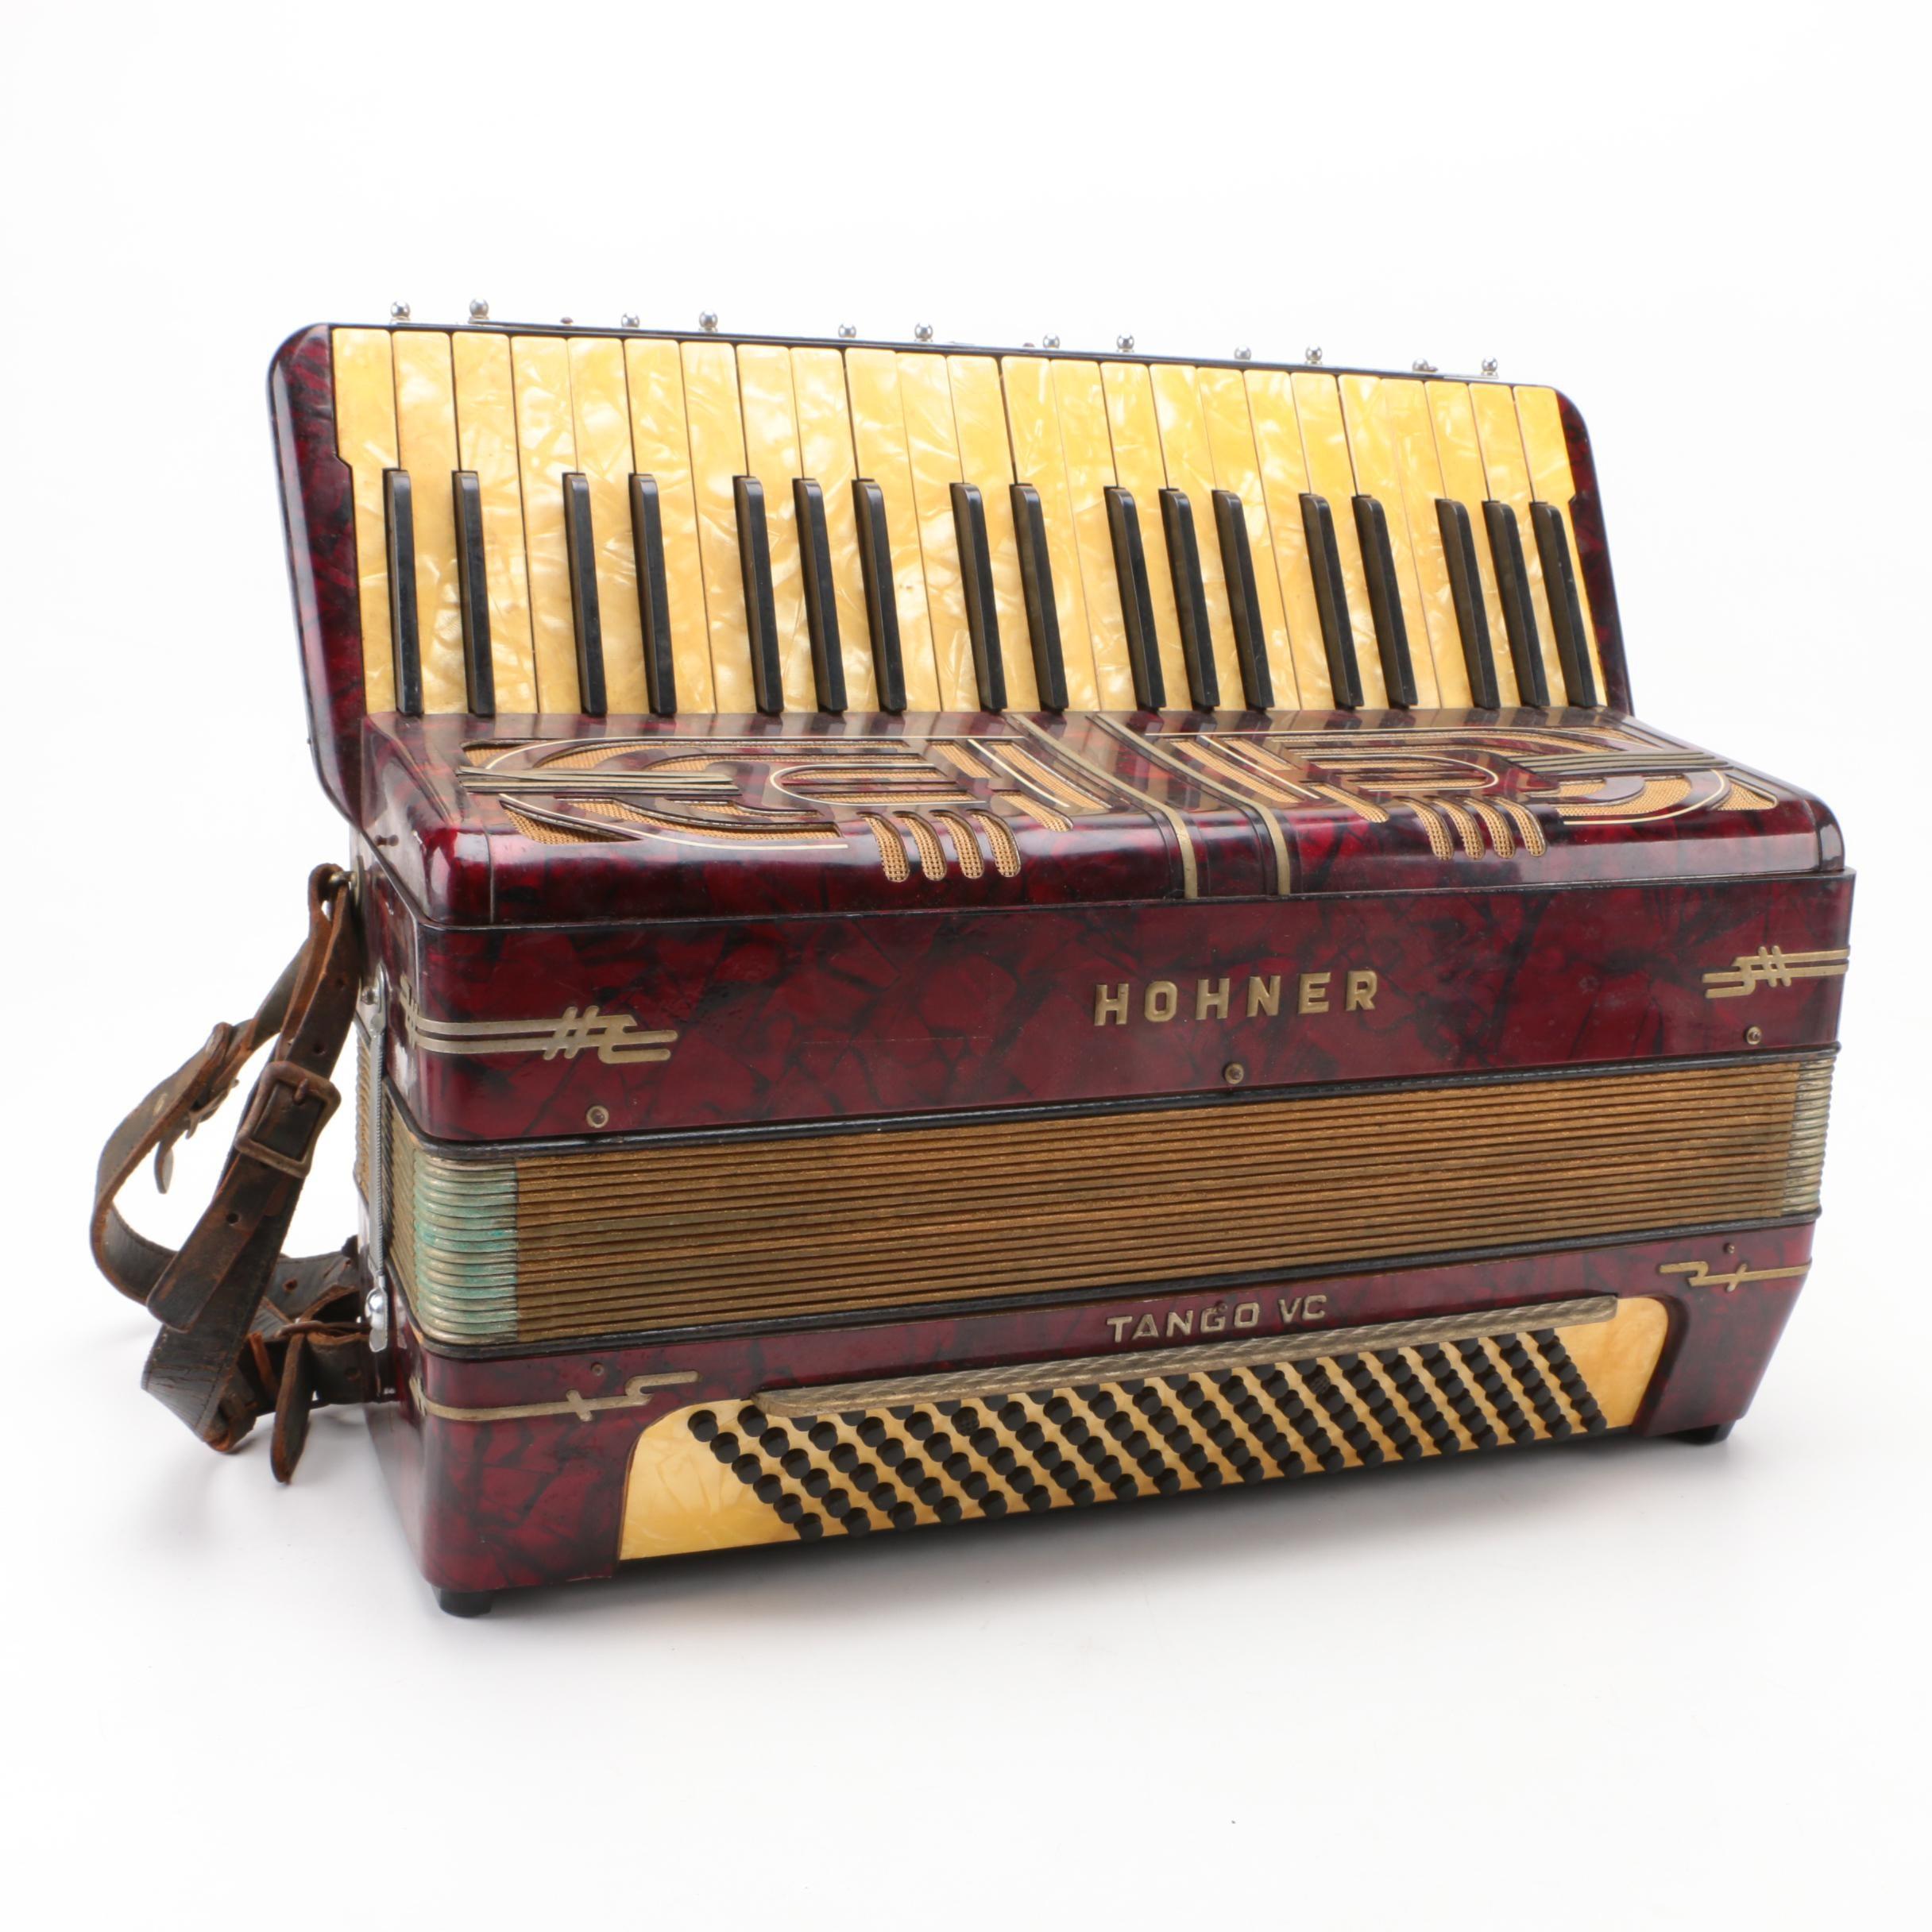 Circa 1930s Hohner Tango VC Piano Accordion